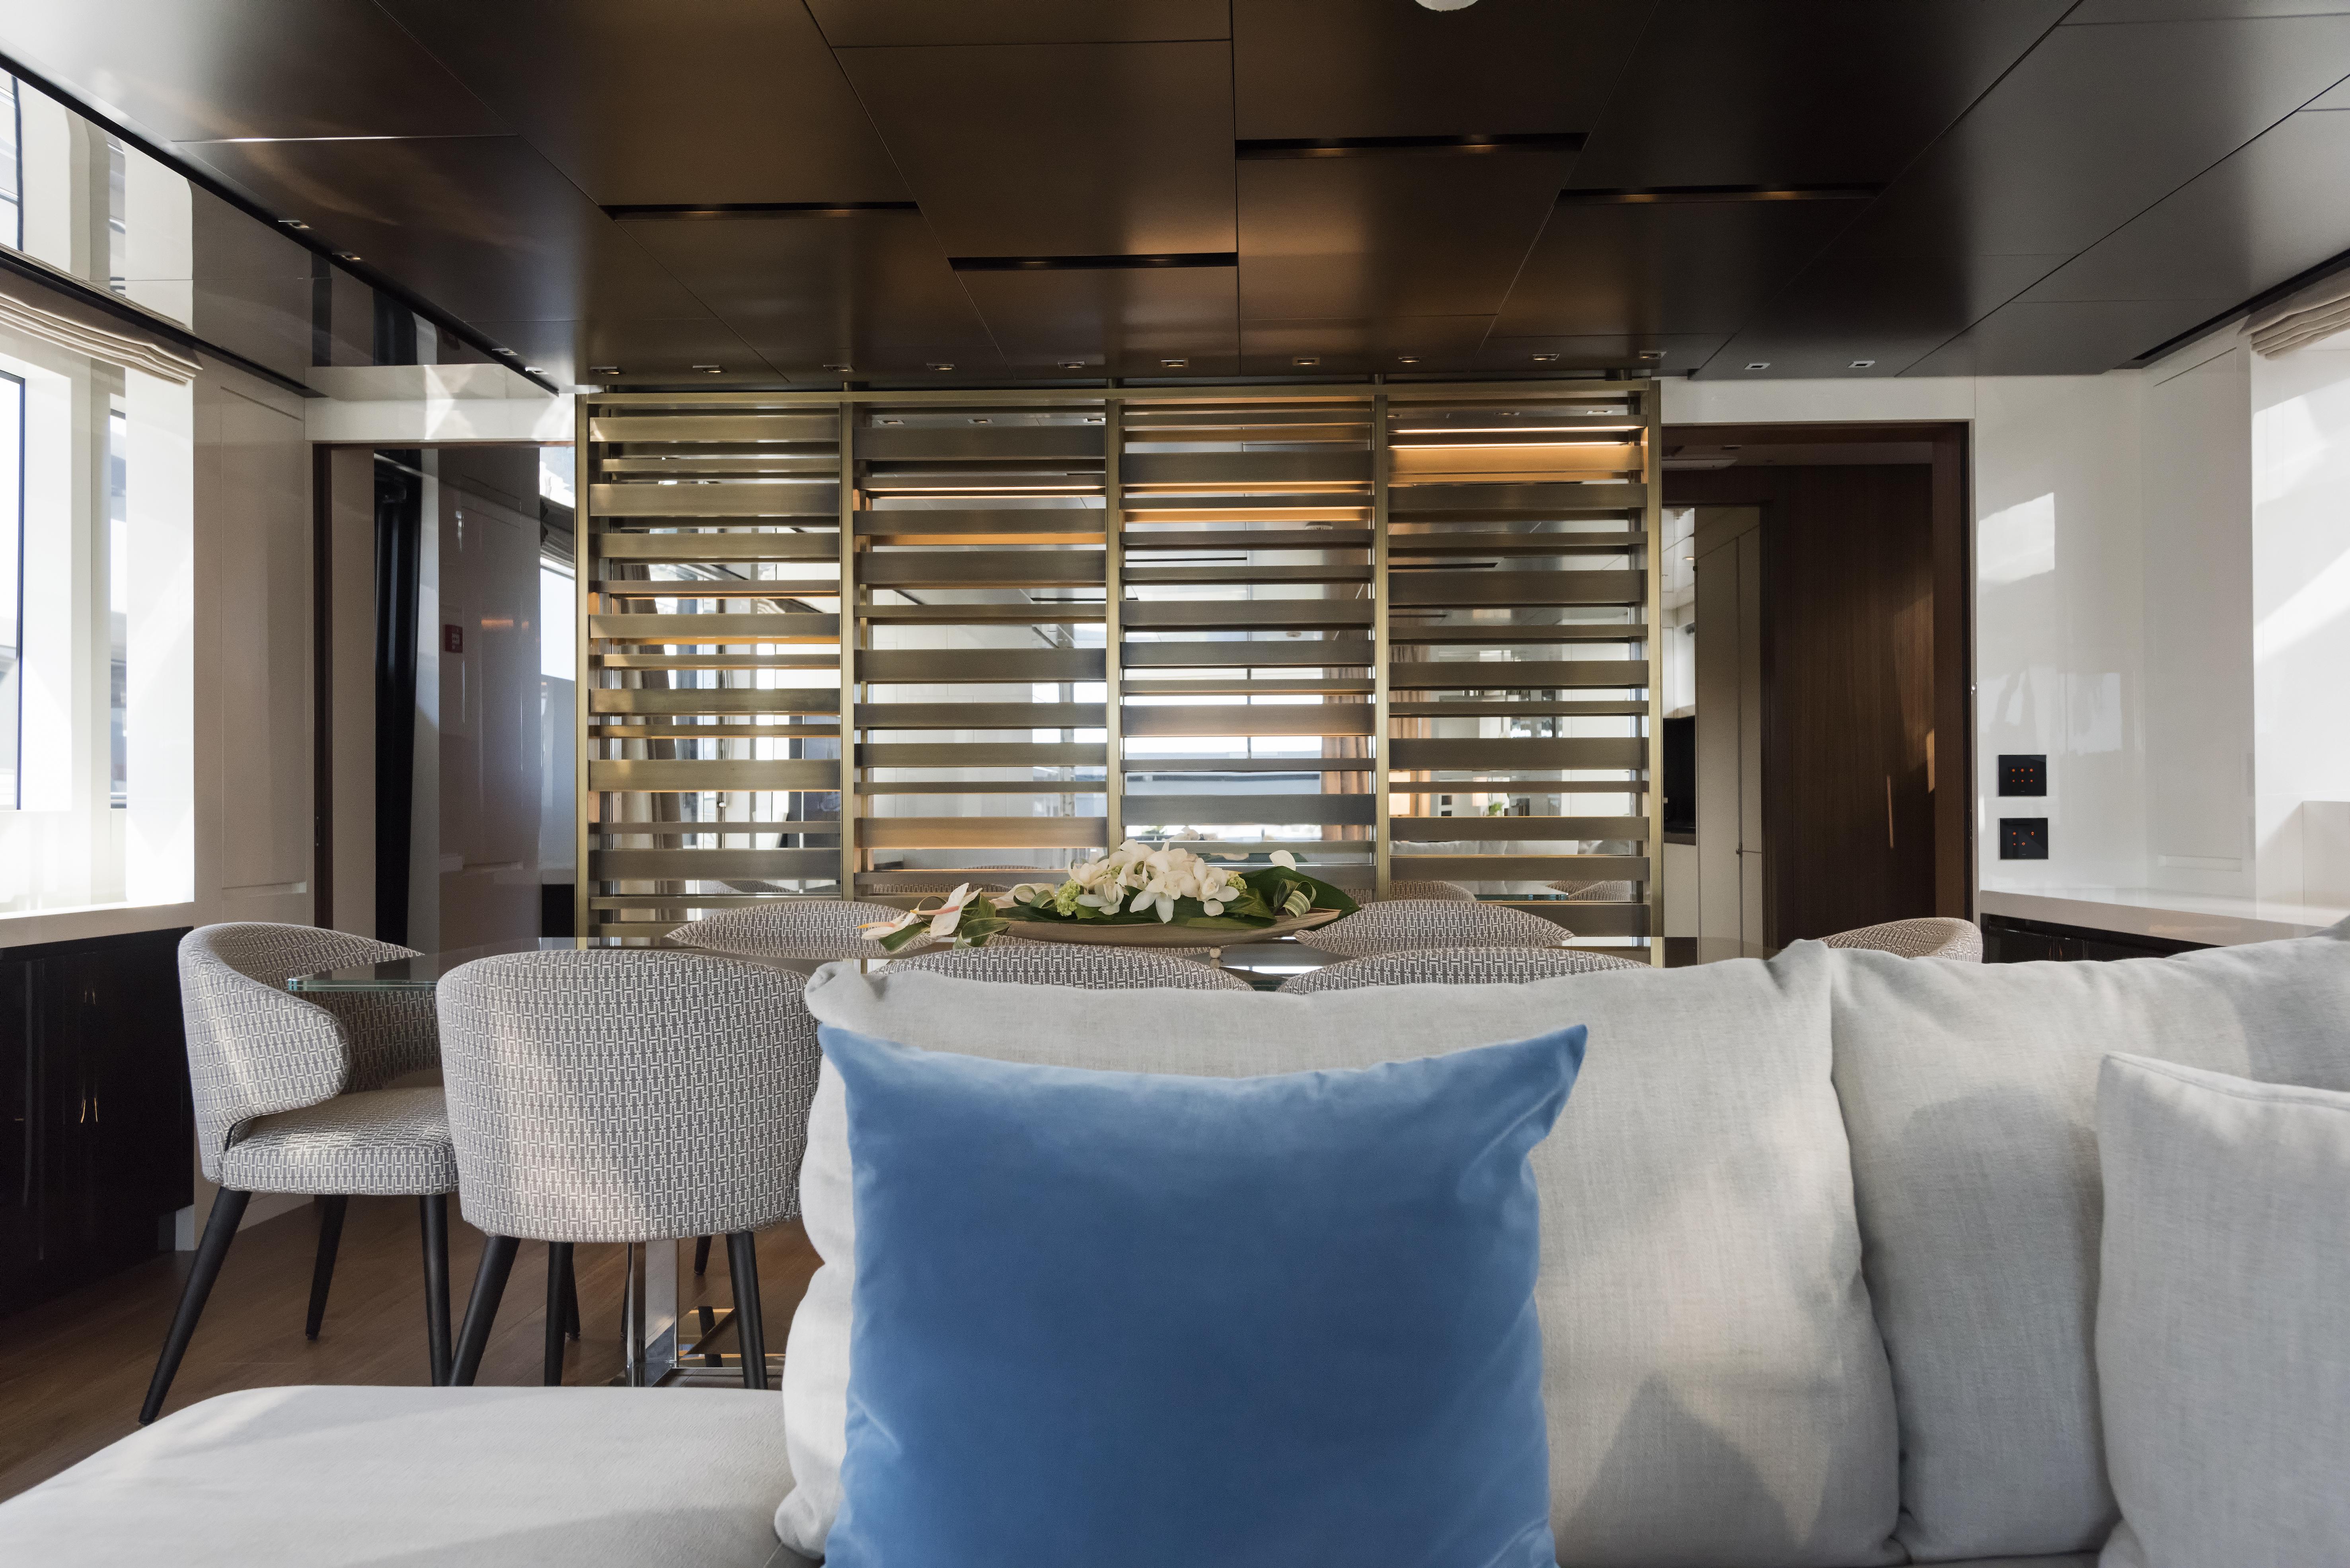 SL 106.644 interior dining area